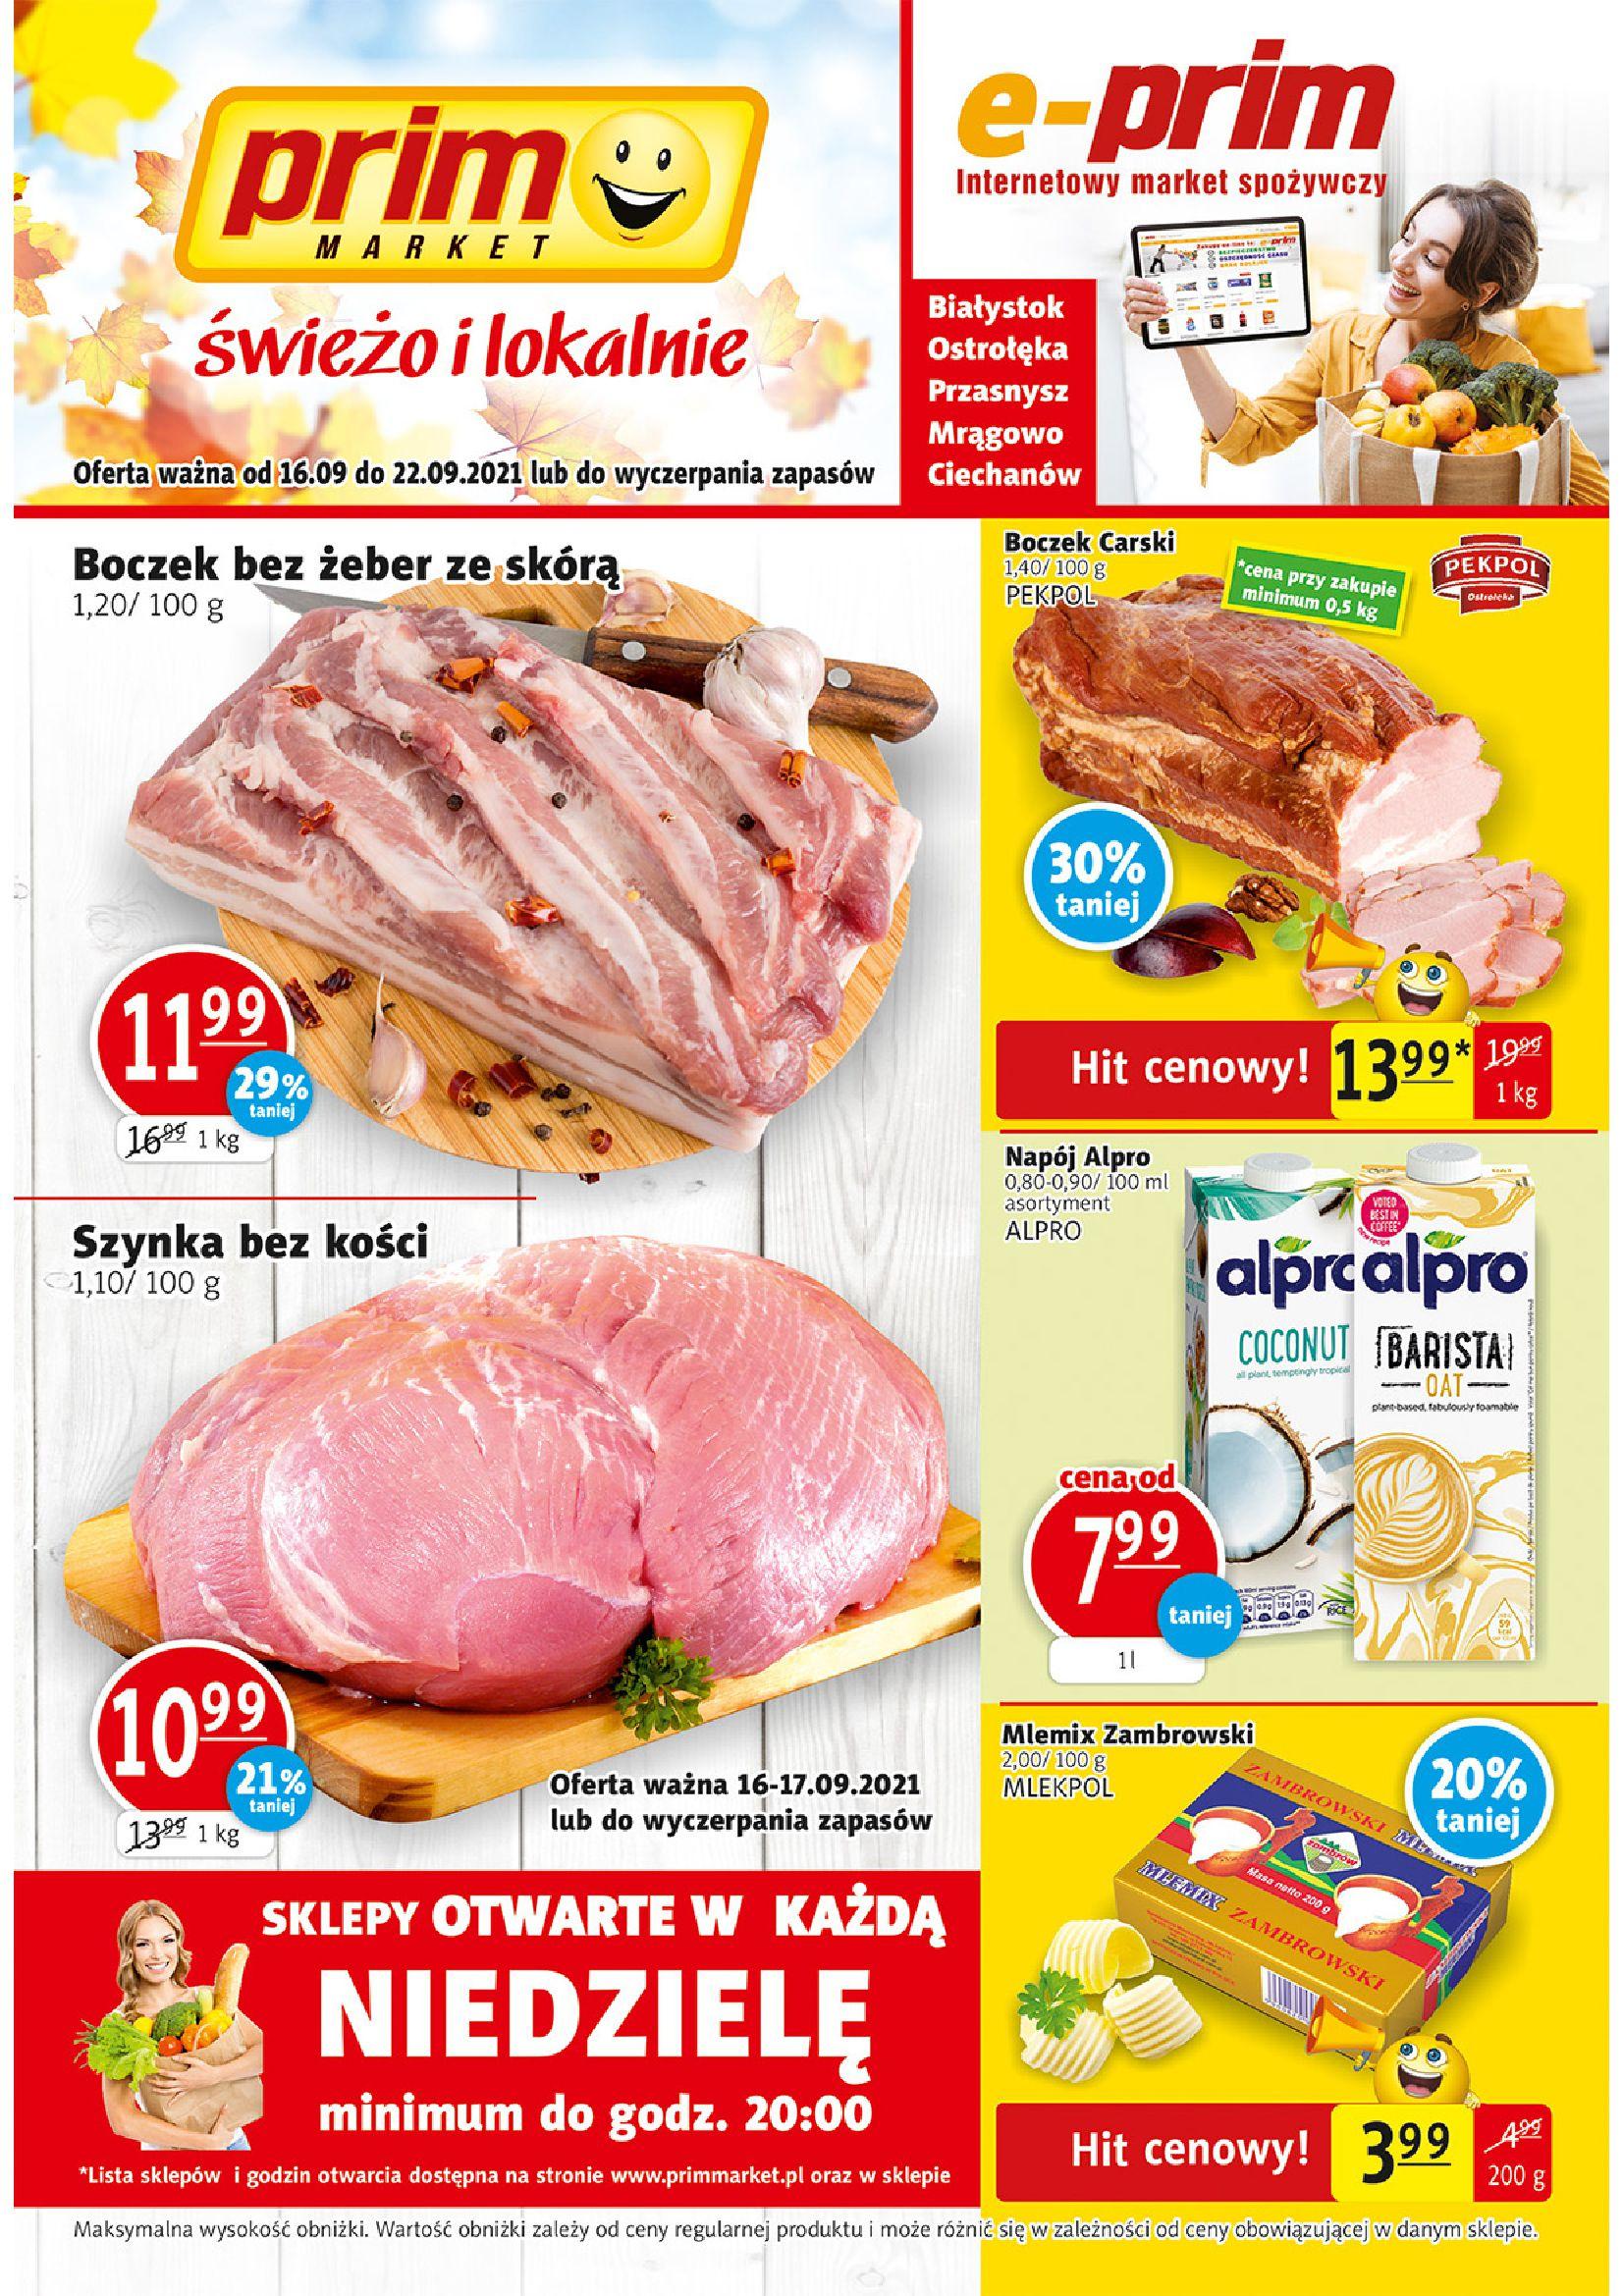 Gazetka PRIM MARKET: Gazetka PRIM MARKET - 16-22.09. 2021-09-16 page-1